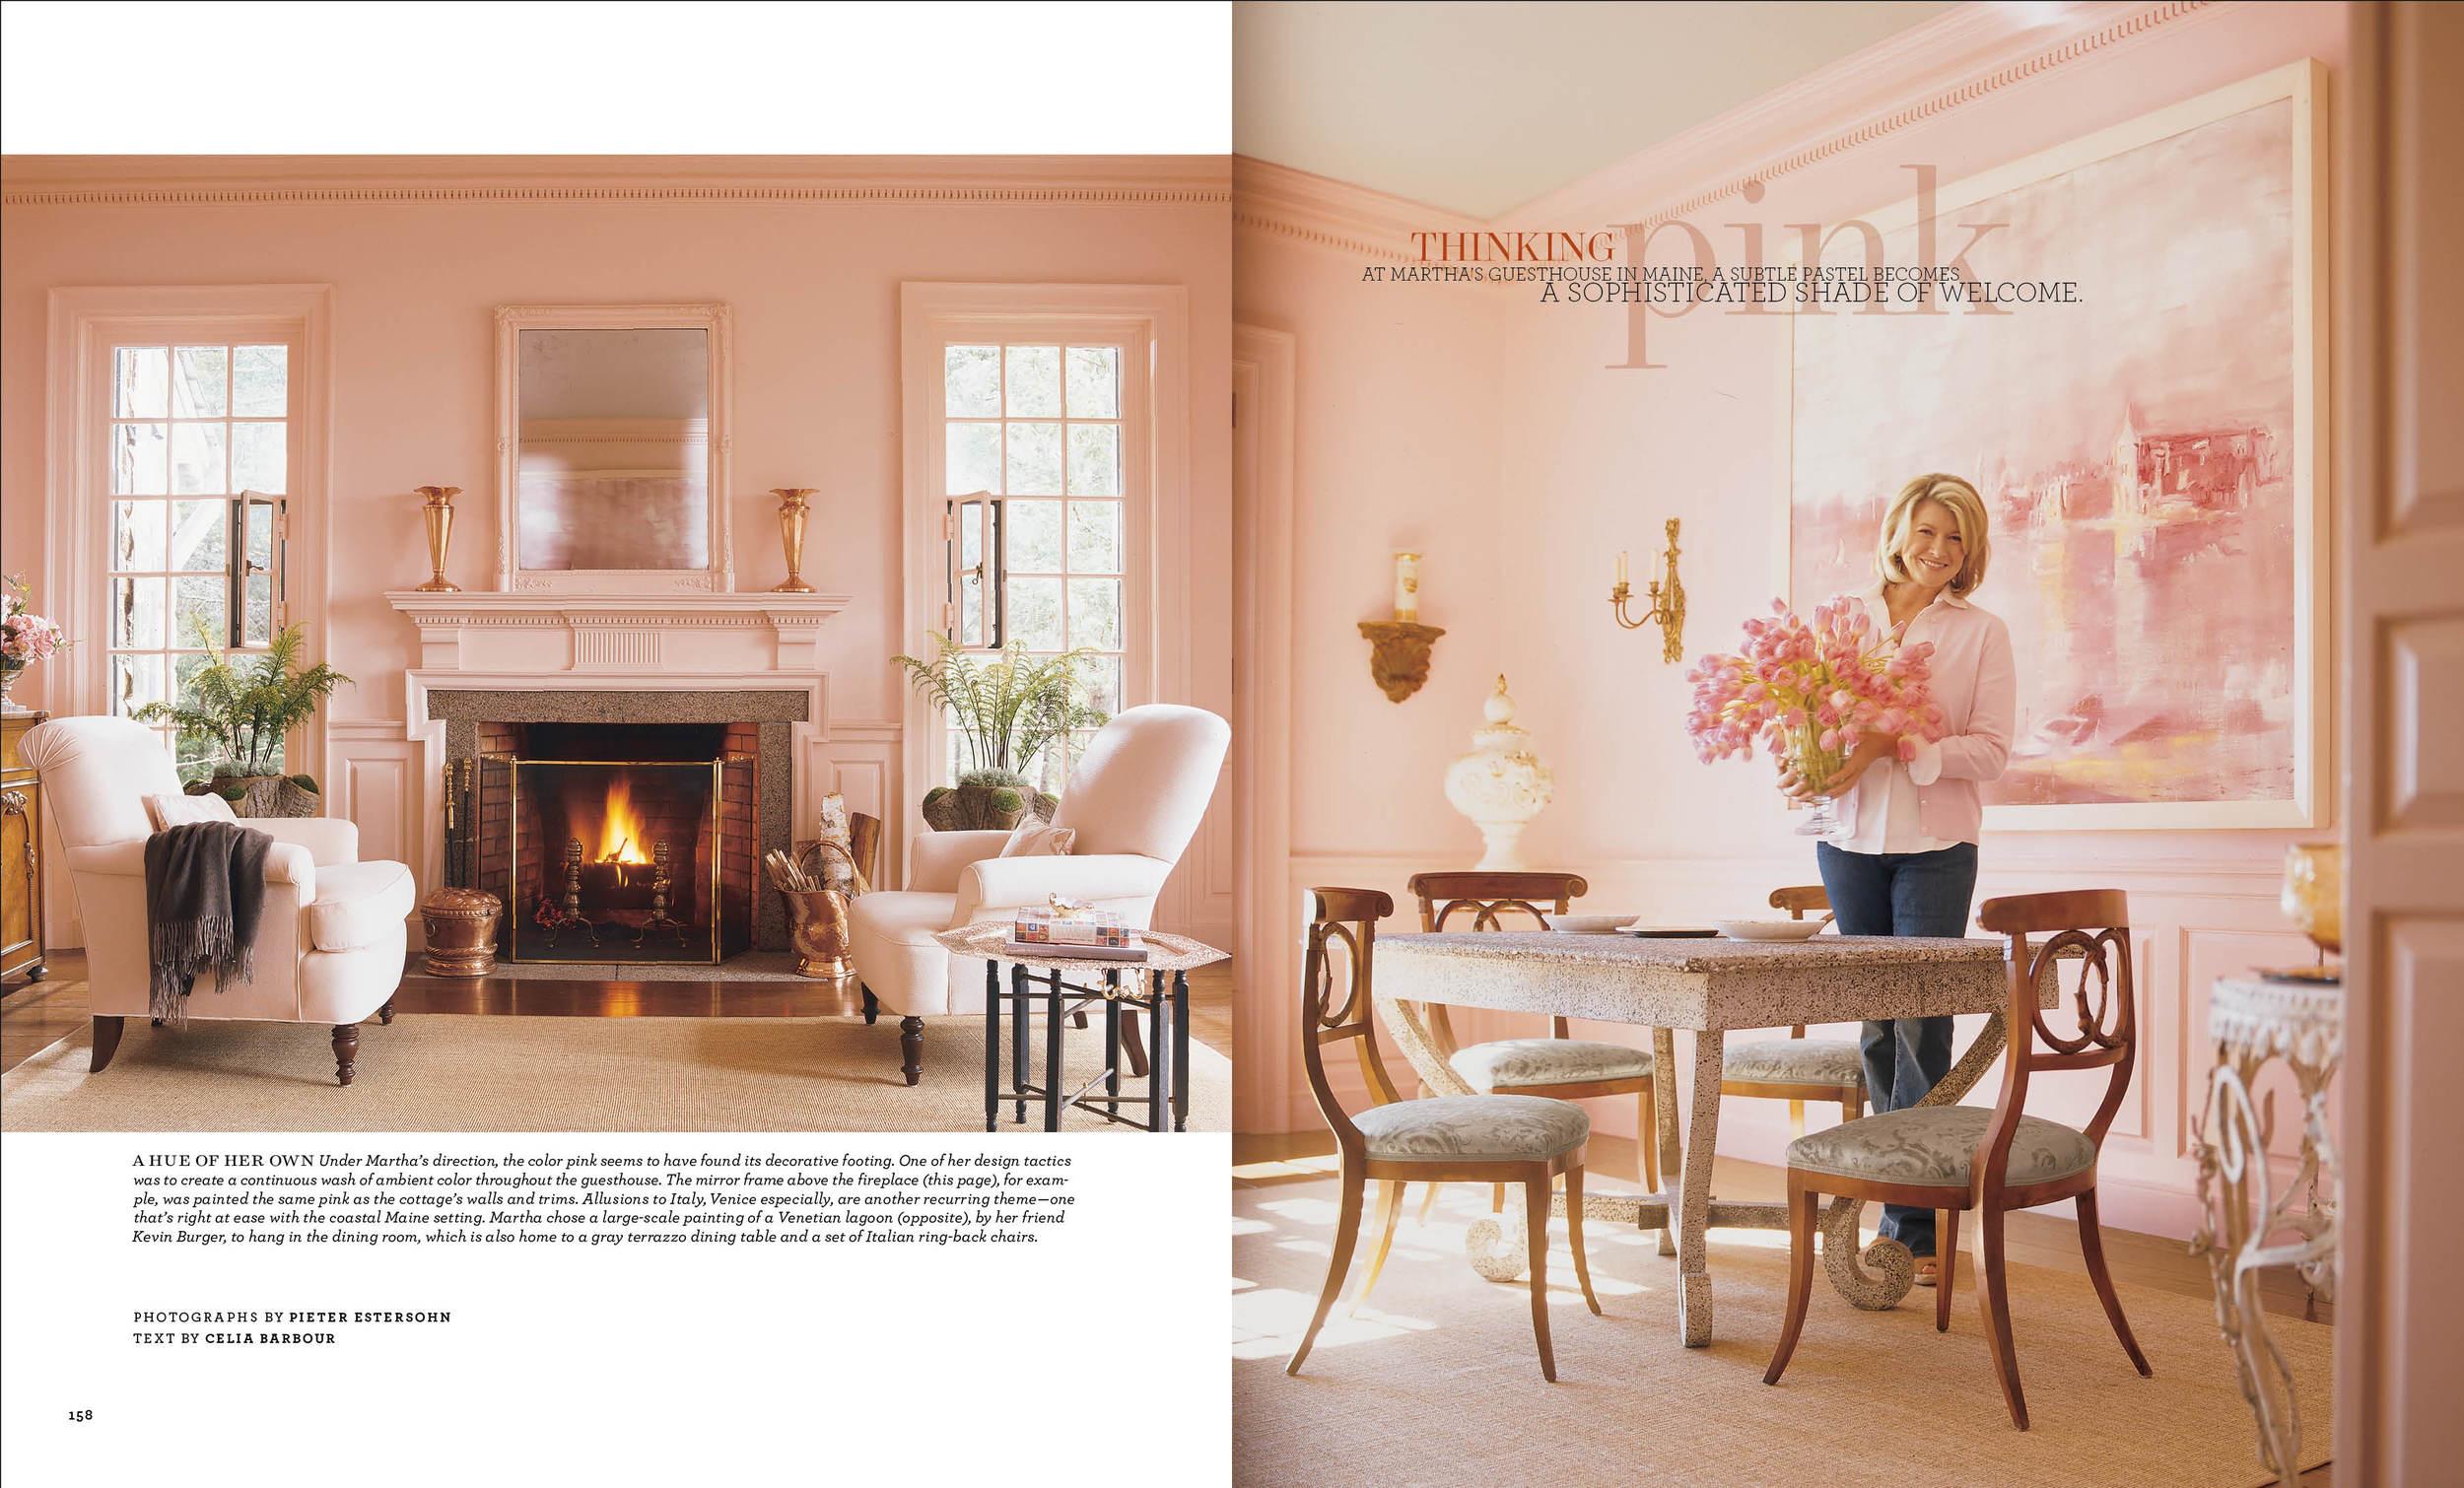 PinkHouse copy.jpg